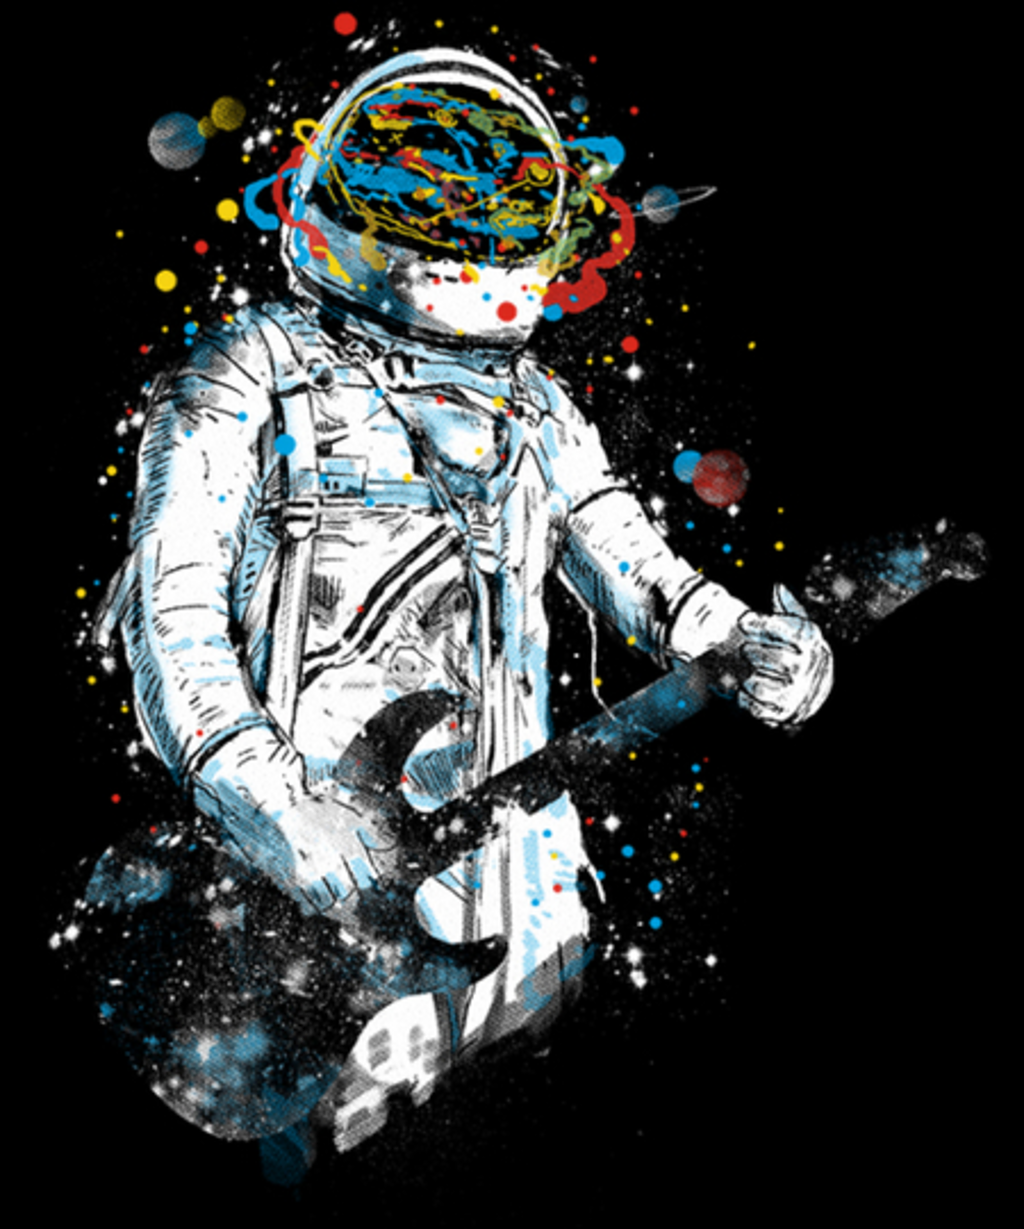 Qwertee: space guitar